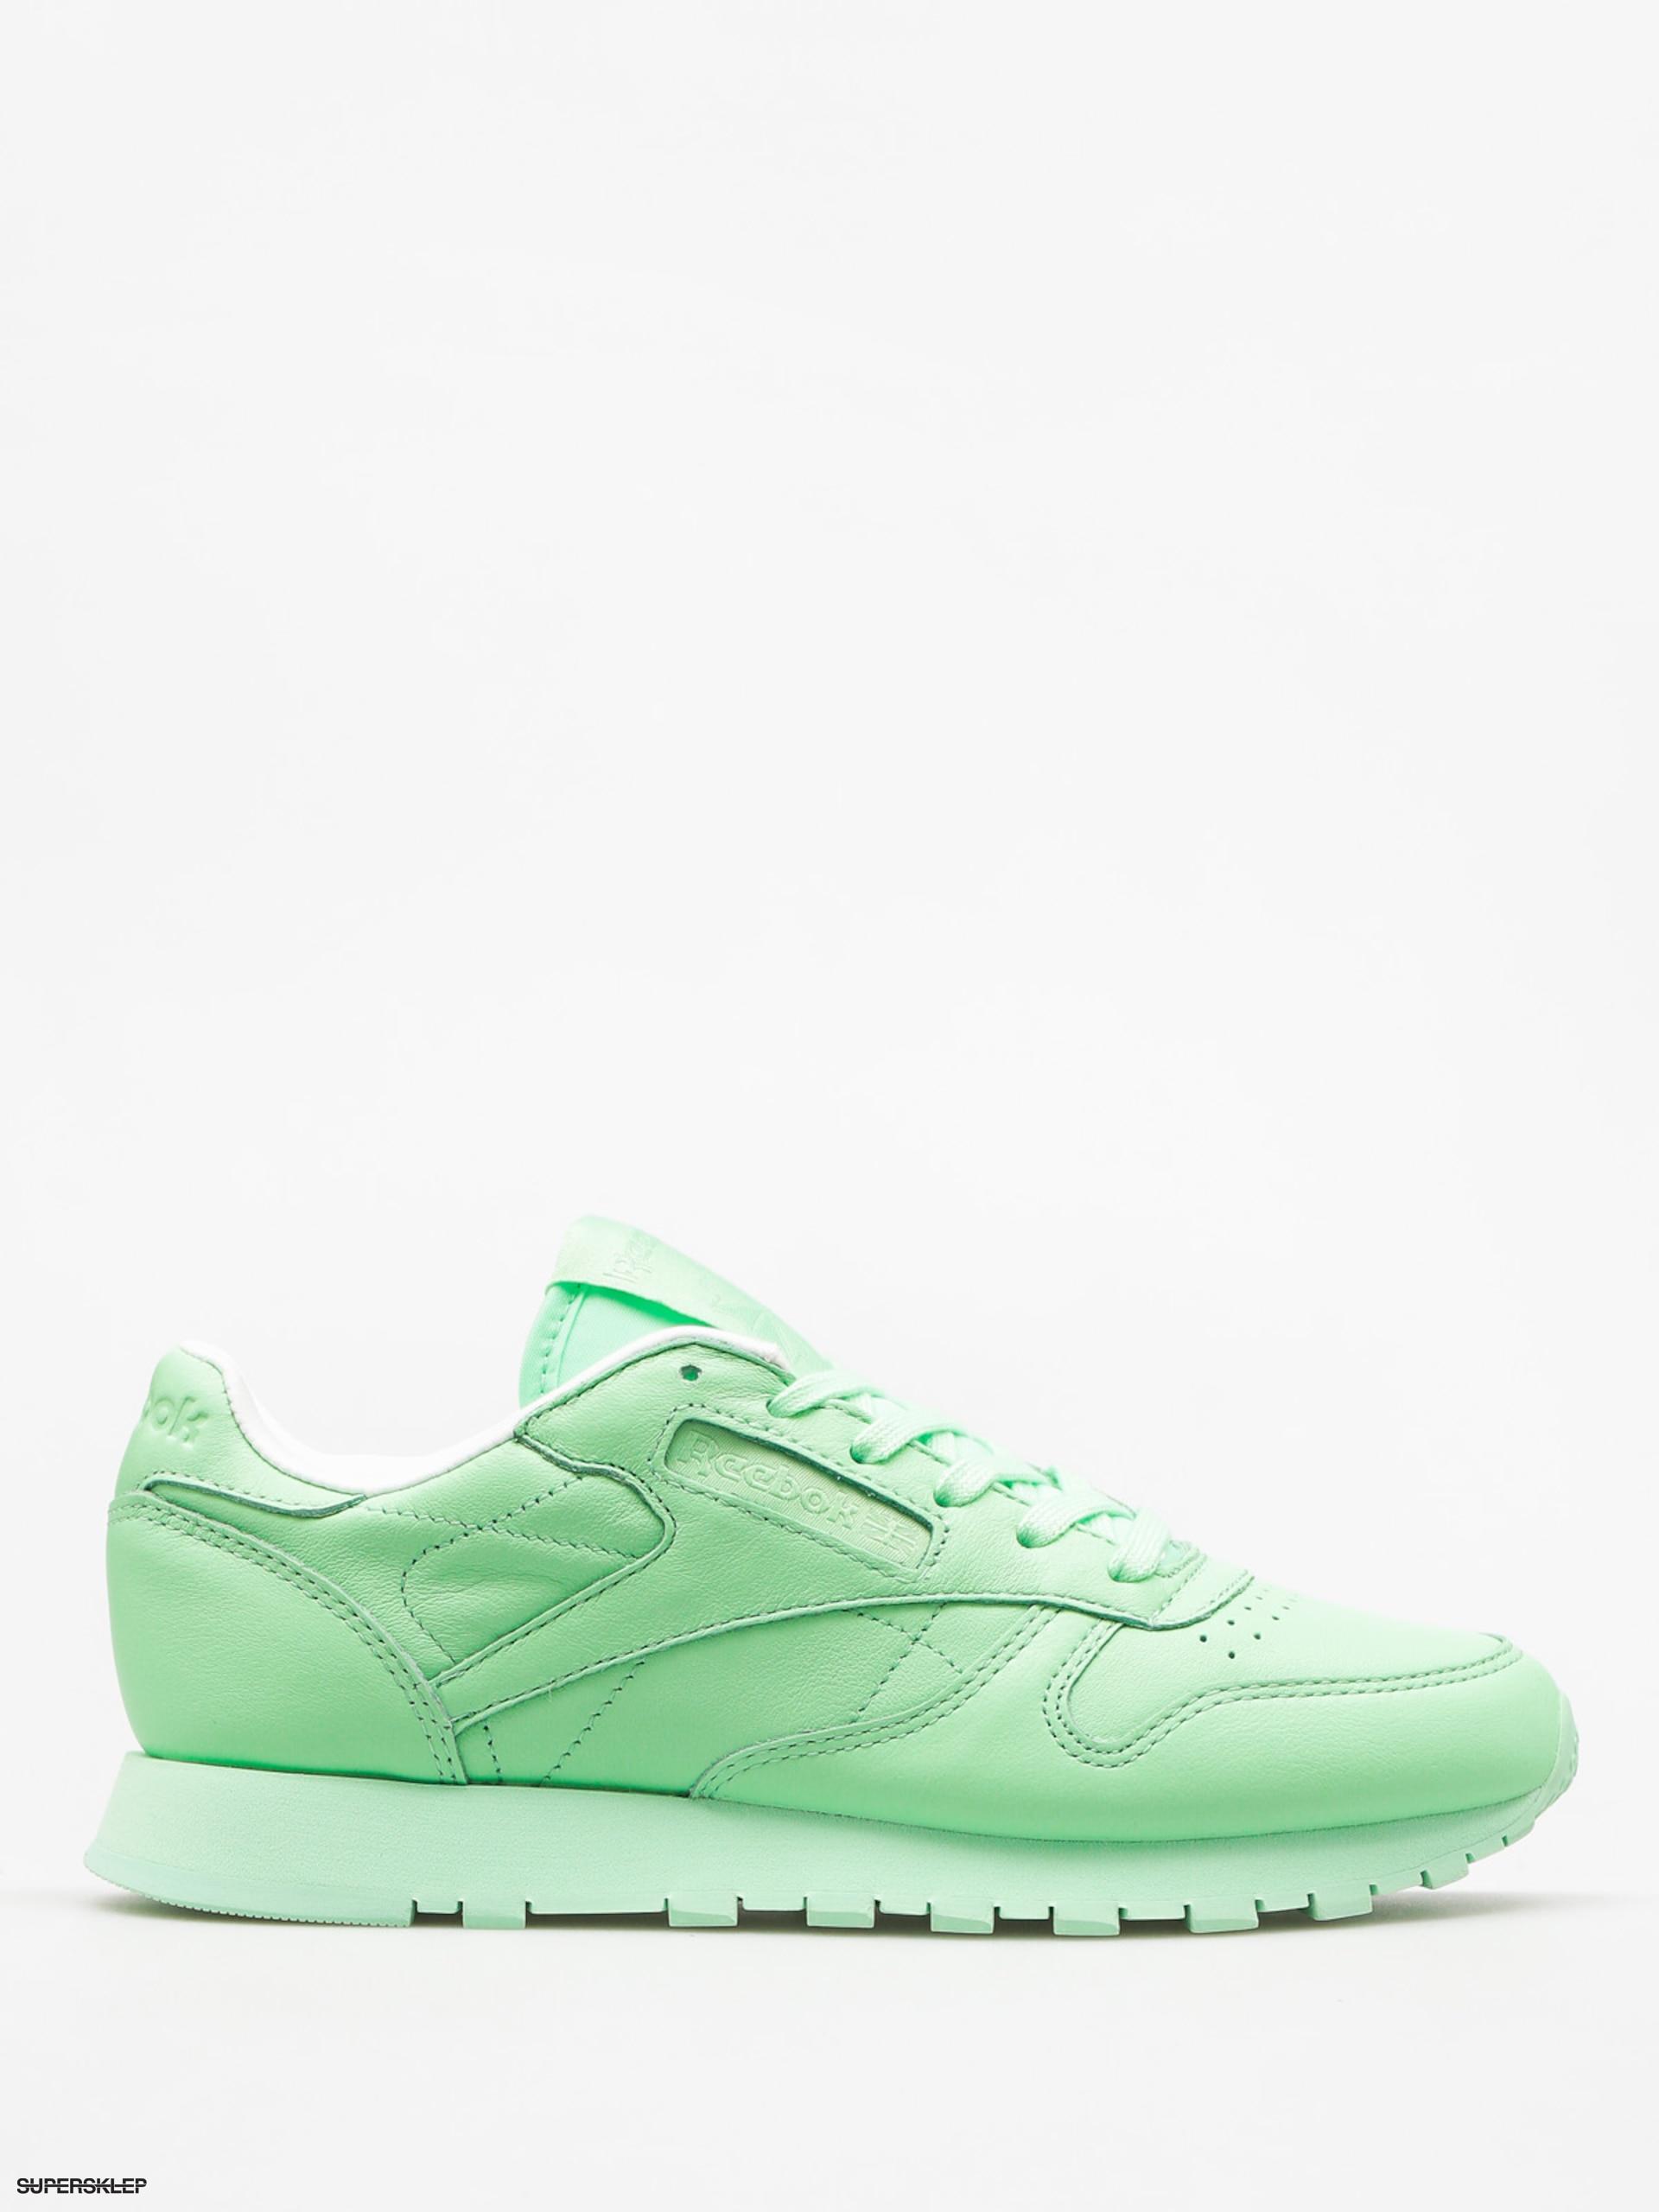 bcb5d7c14154 Buty Reebok Cl Lthr Pastels Wmn (mint green white)